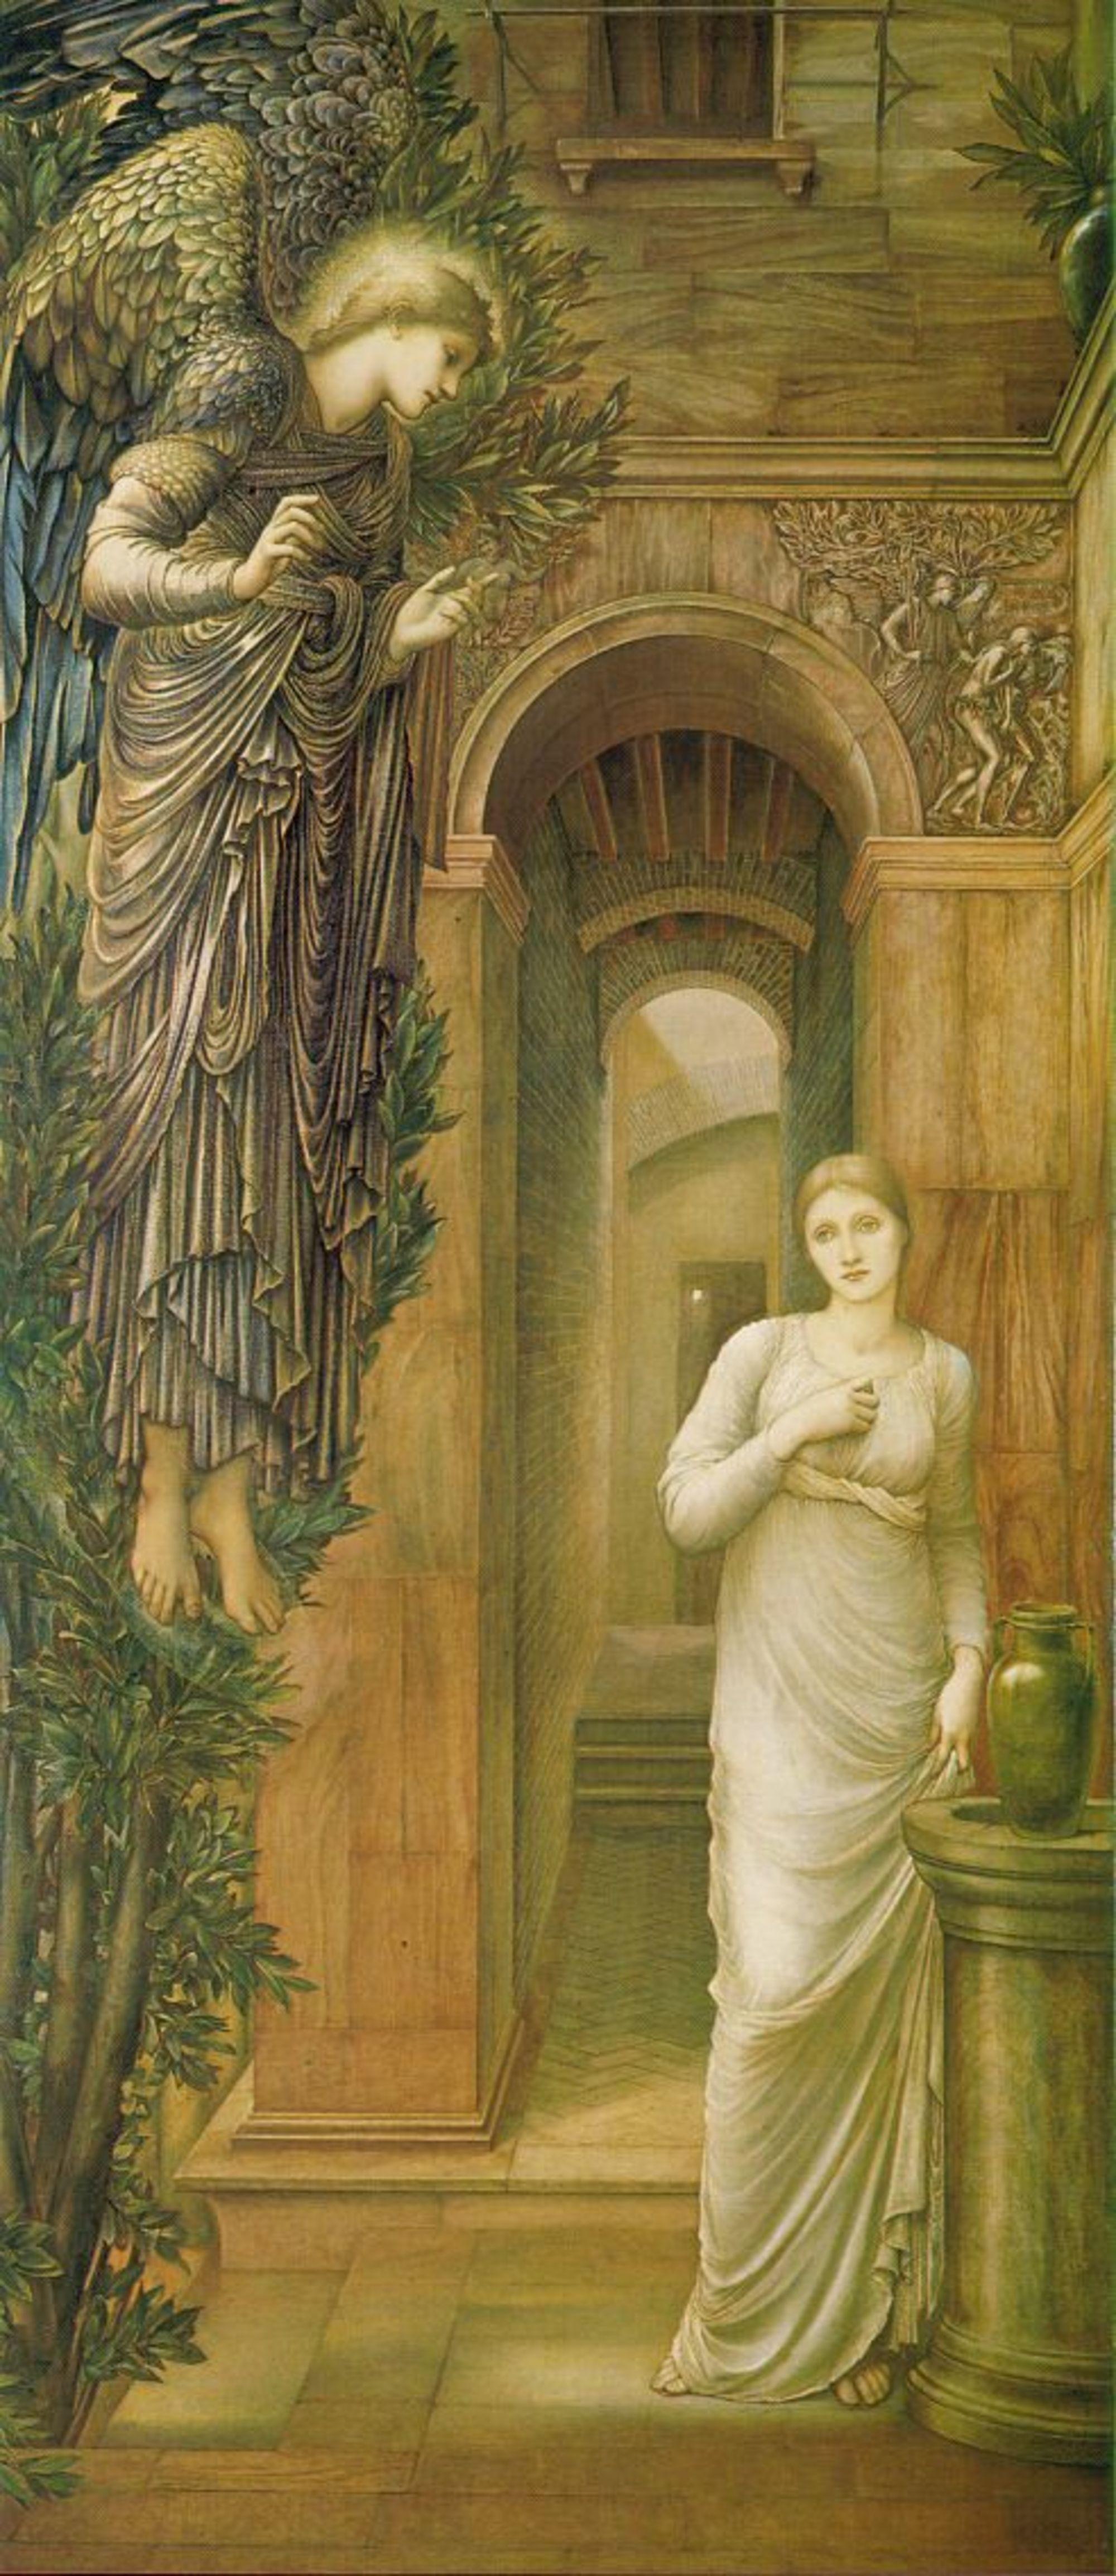 Edward_Burne-Jones_The_Annunciation.jpg